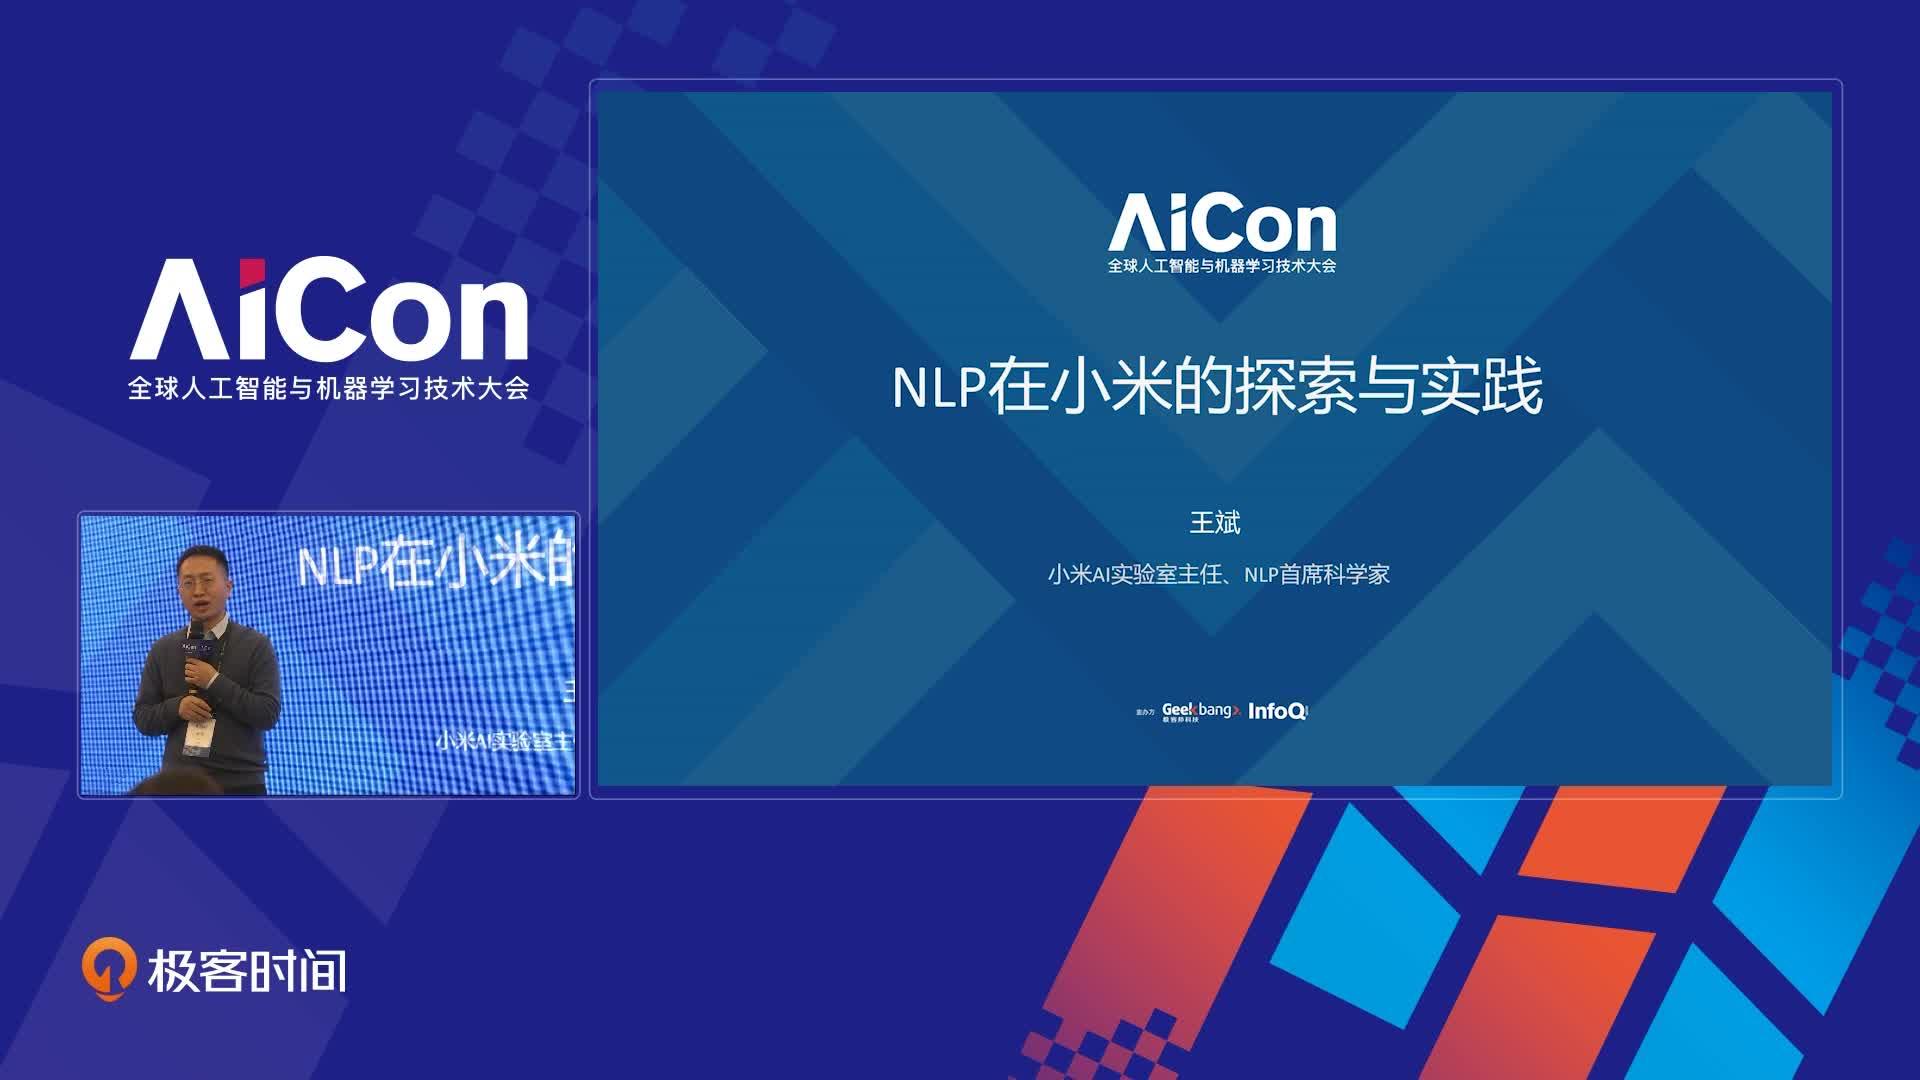 NLP在小米的探索与实践丨AlCon